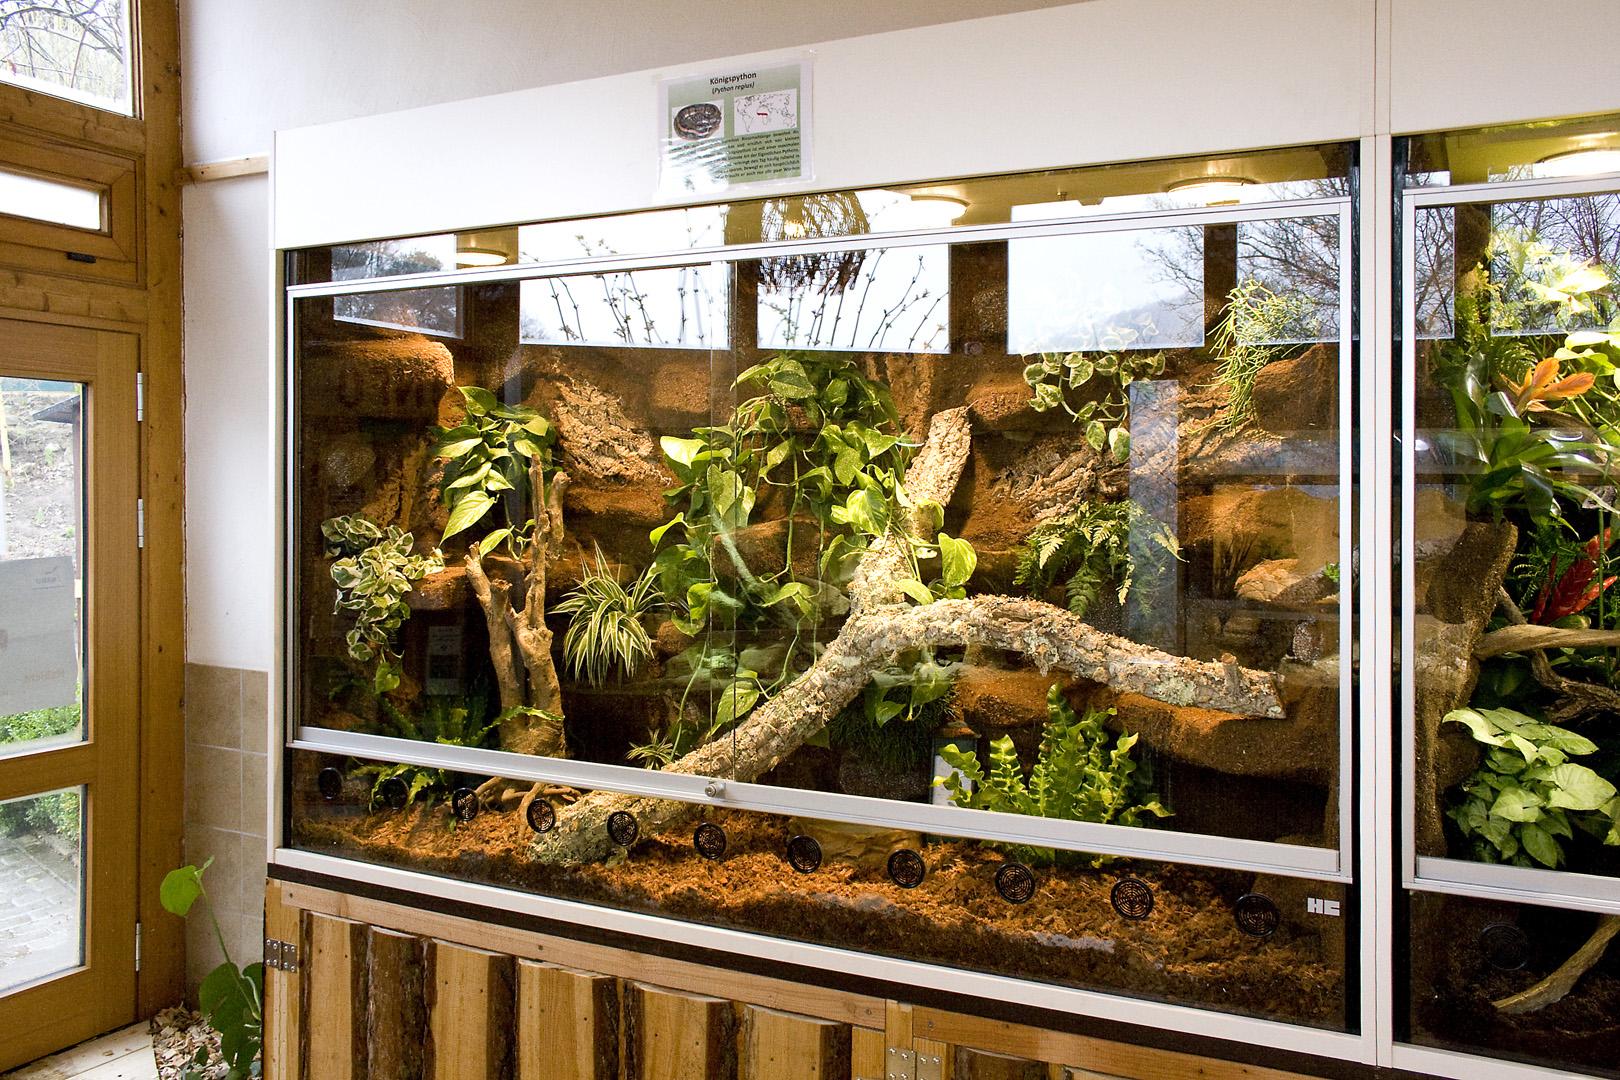 terrarium f r k nigspythons f r den tierpark herborn. Black Bedroom Furniture Sets. Home Design Ideas